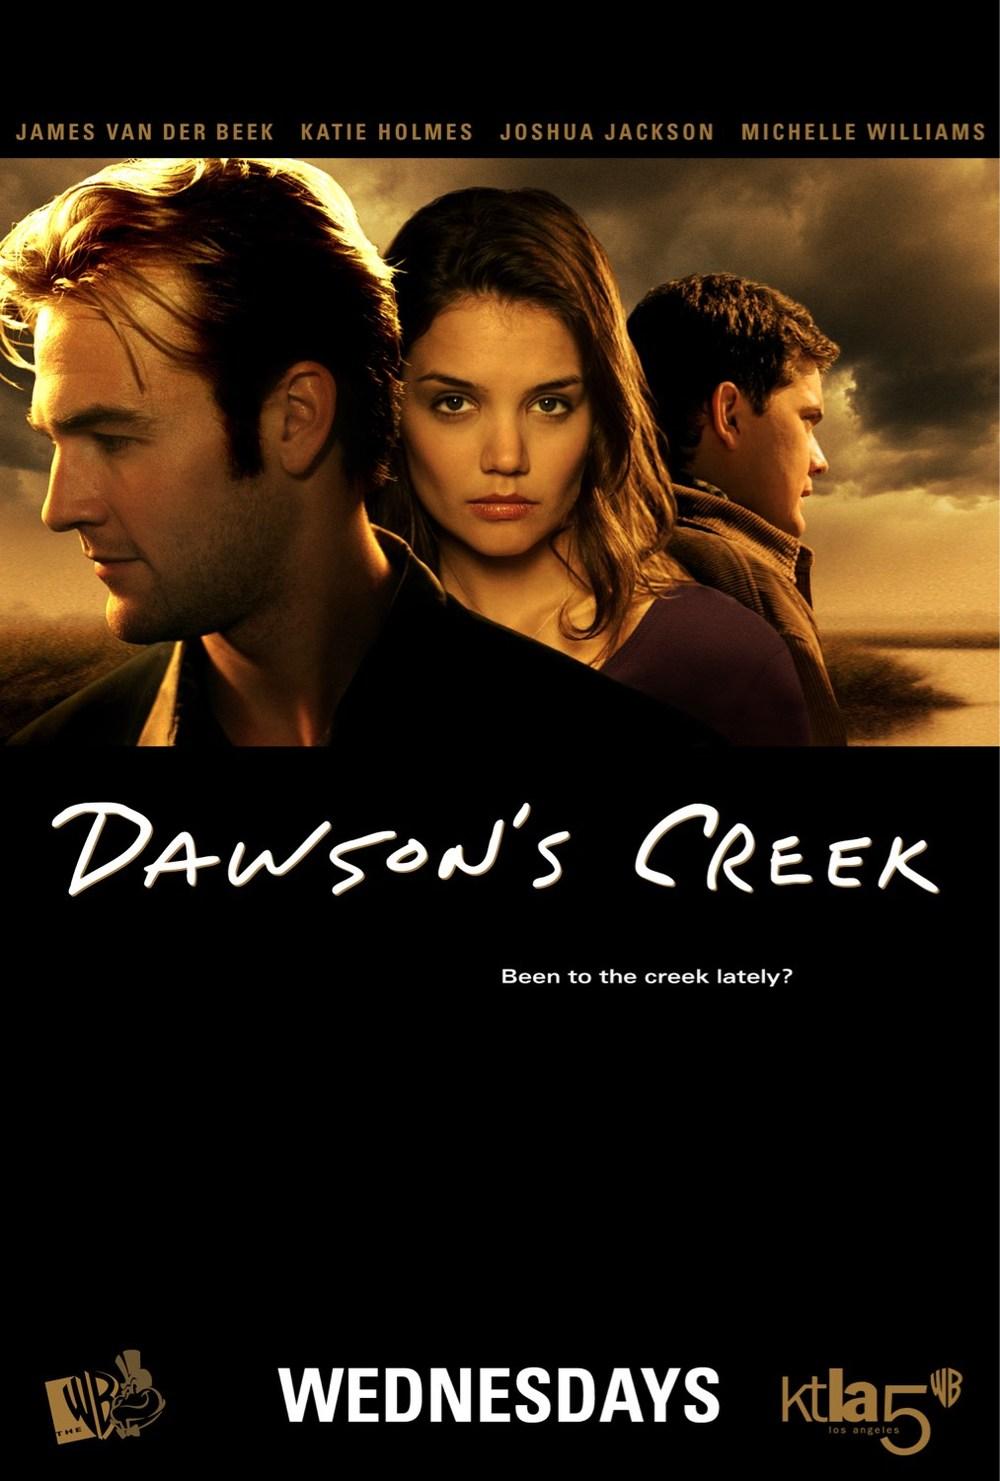 DAWSON'S CREEK C.jpg